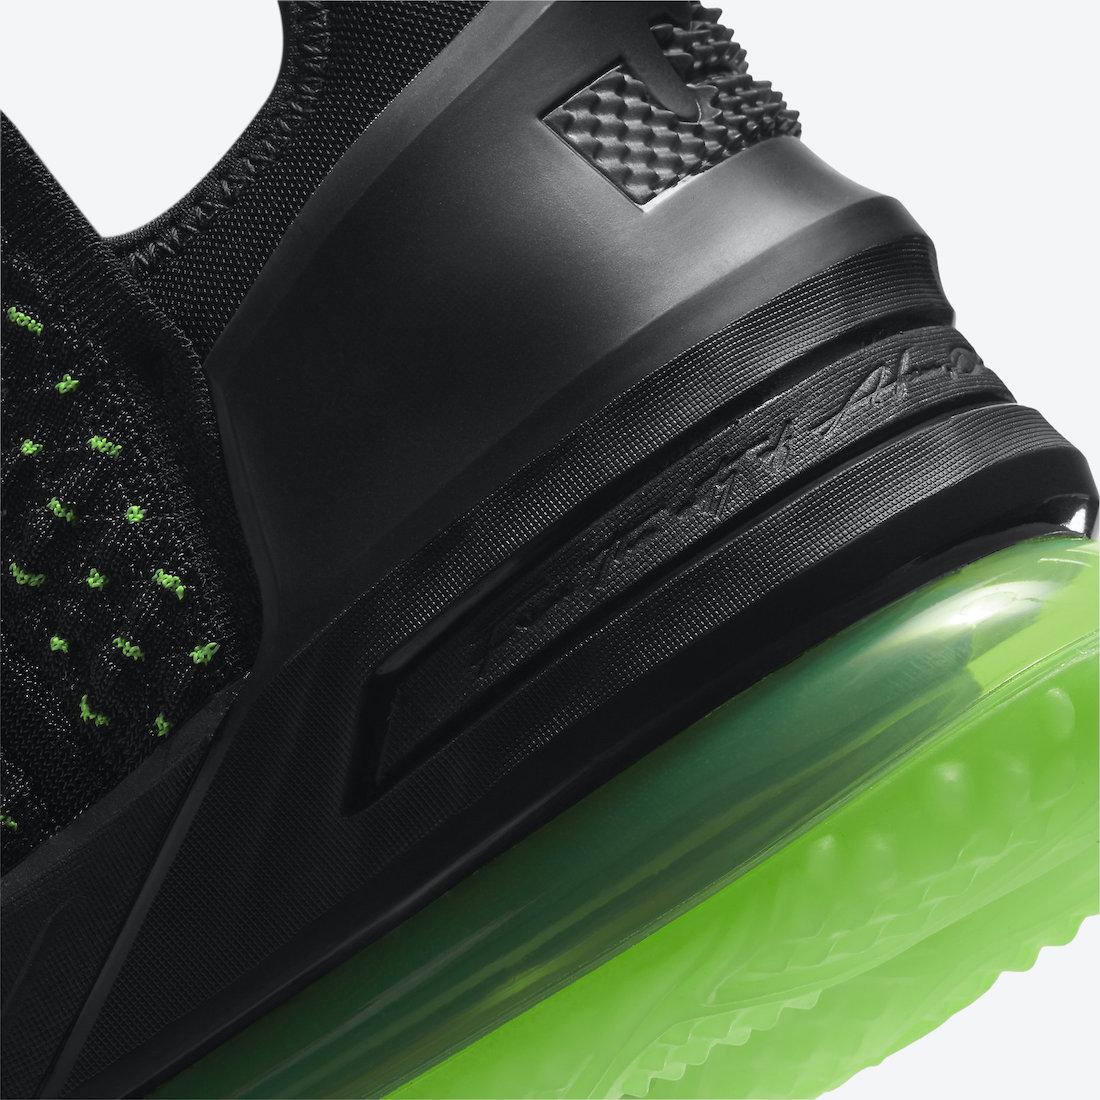 Nike-LeBron-18-Dunkman-CQ9284-005-Release-Date-7